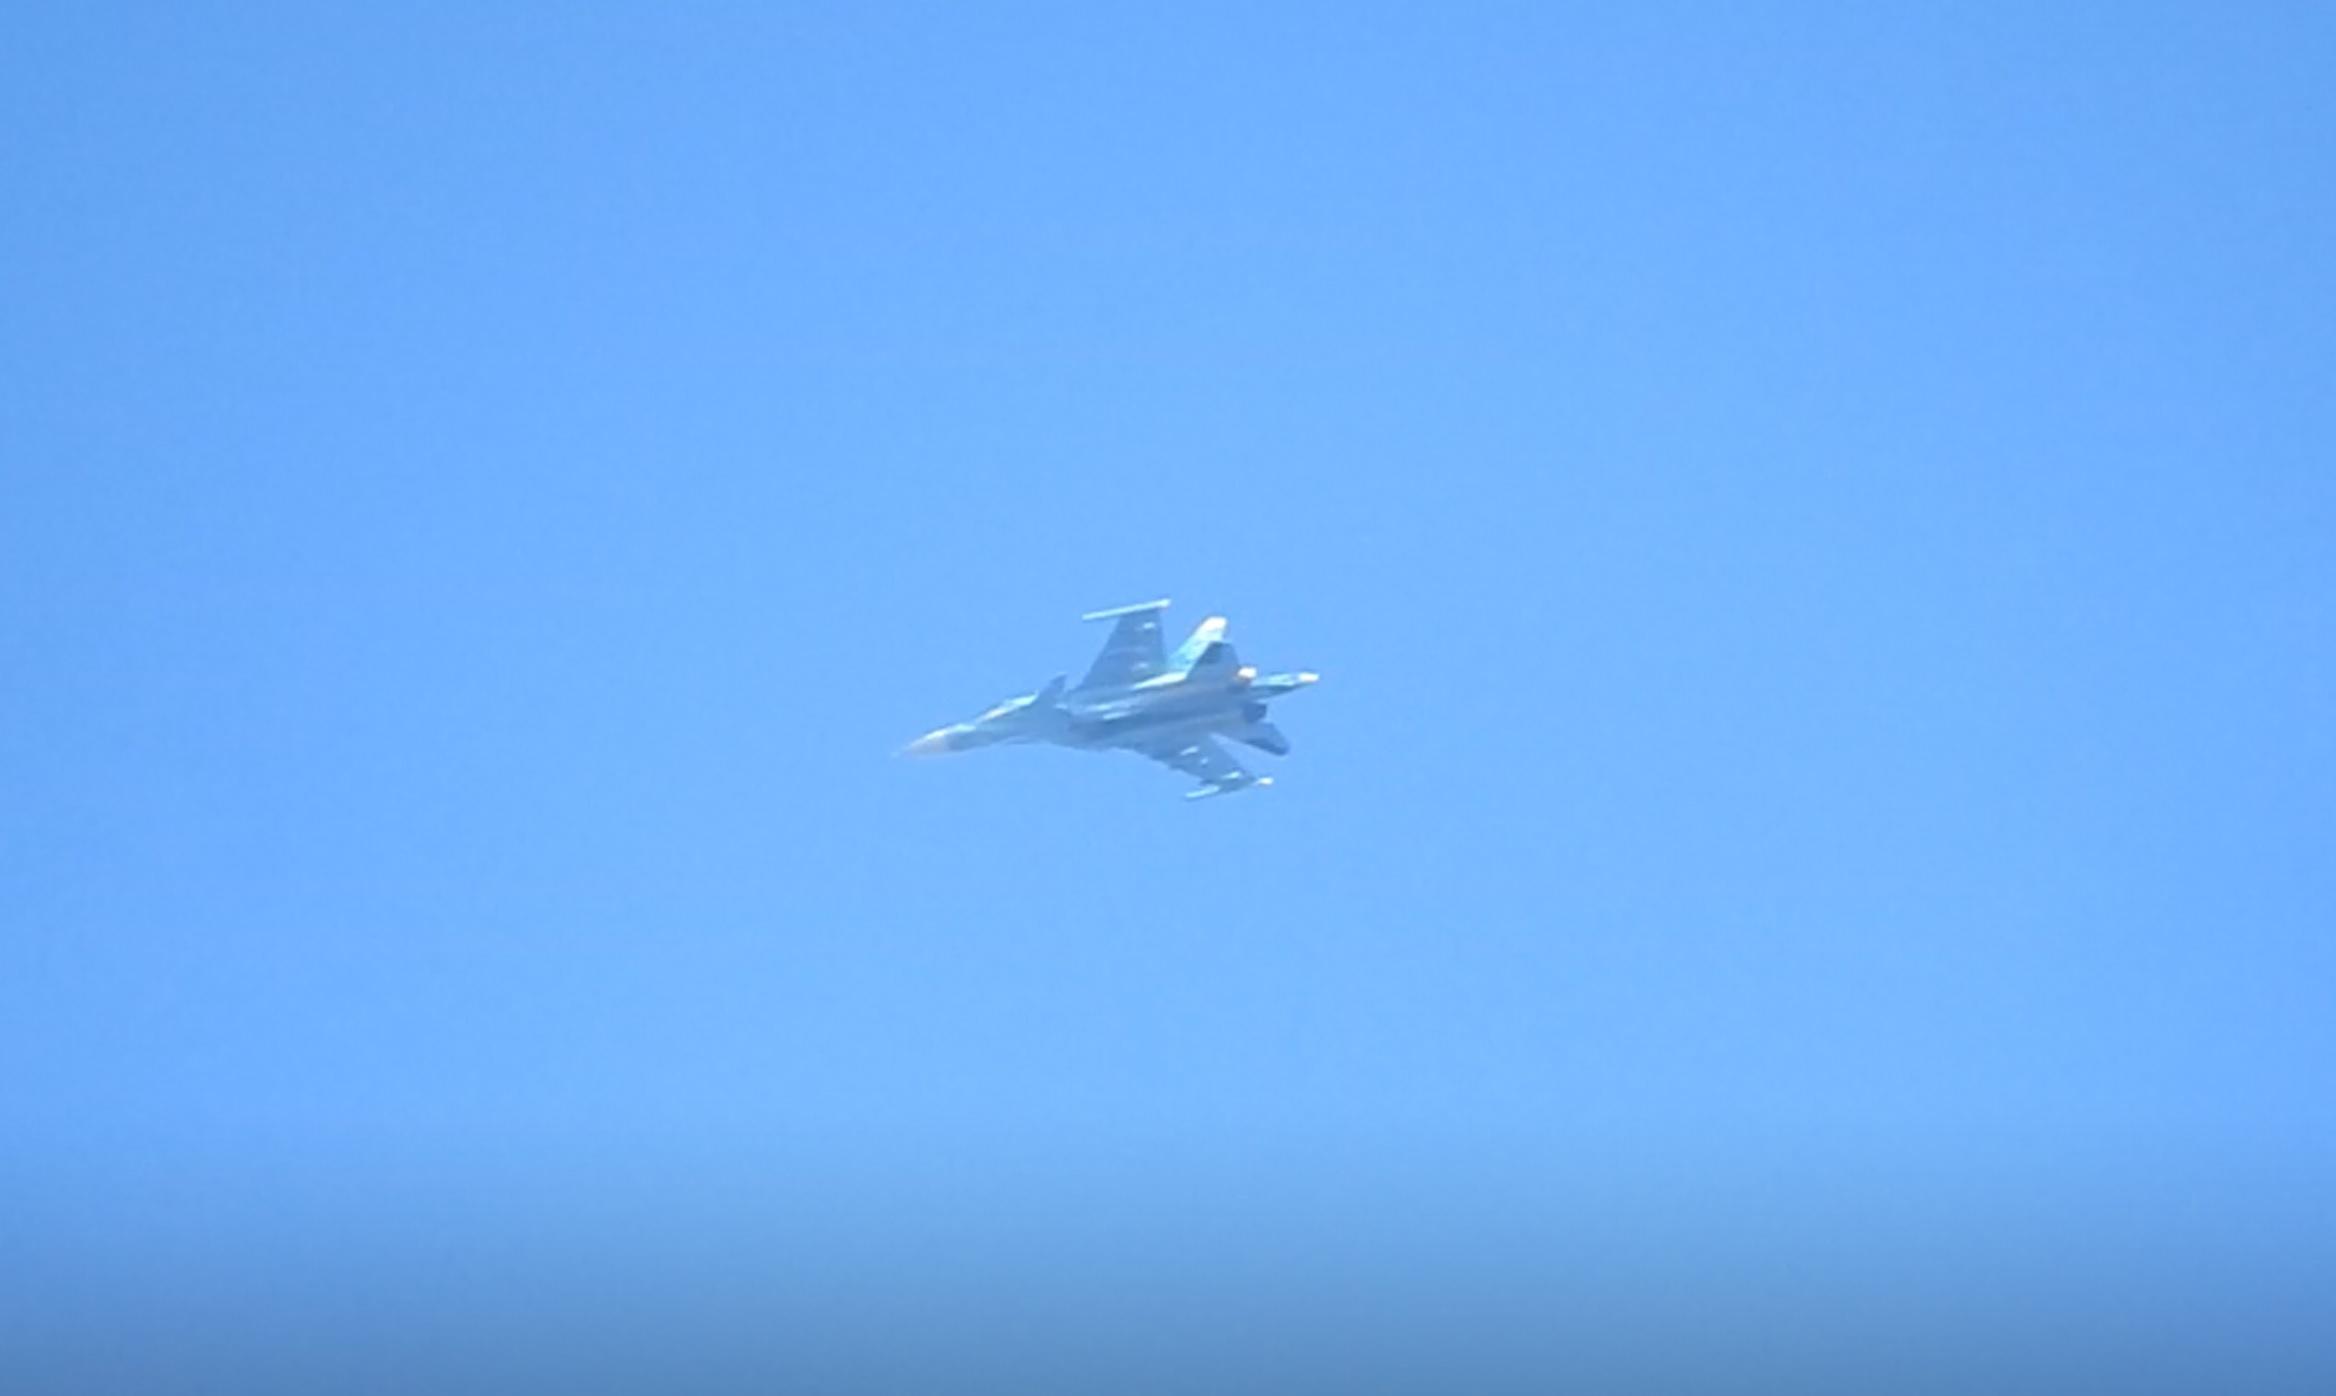 Russian Warplanes Strike Militants In Northern Lattakia Following Attack On Syrian Army